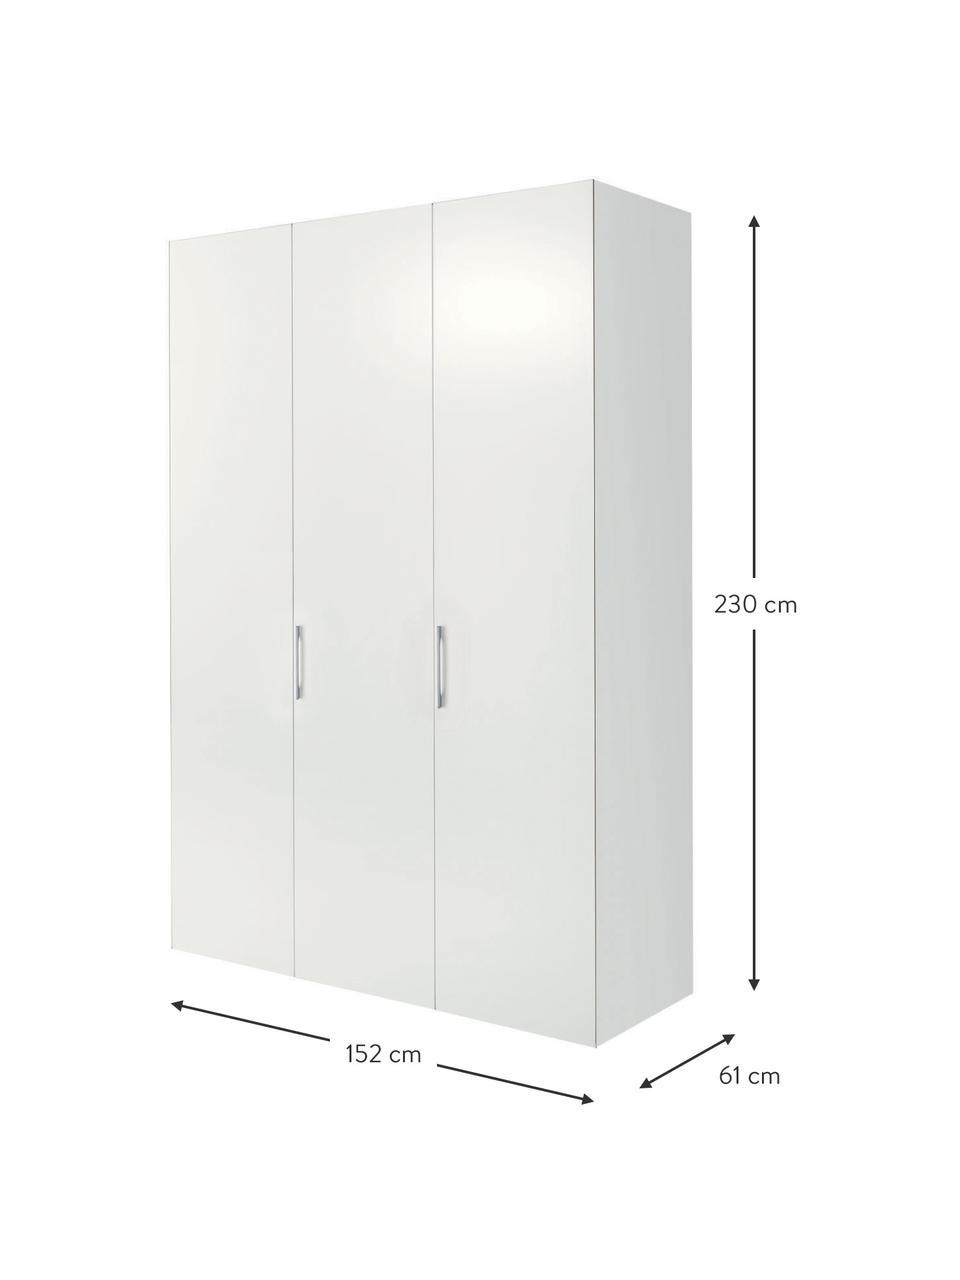 Witte kledingkast Madison, Frame: panelen op houtbasis, gel, Wit, 152 x 230 cm